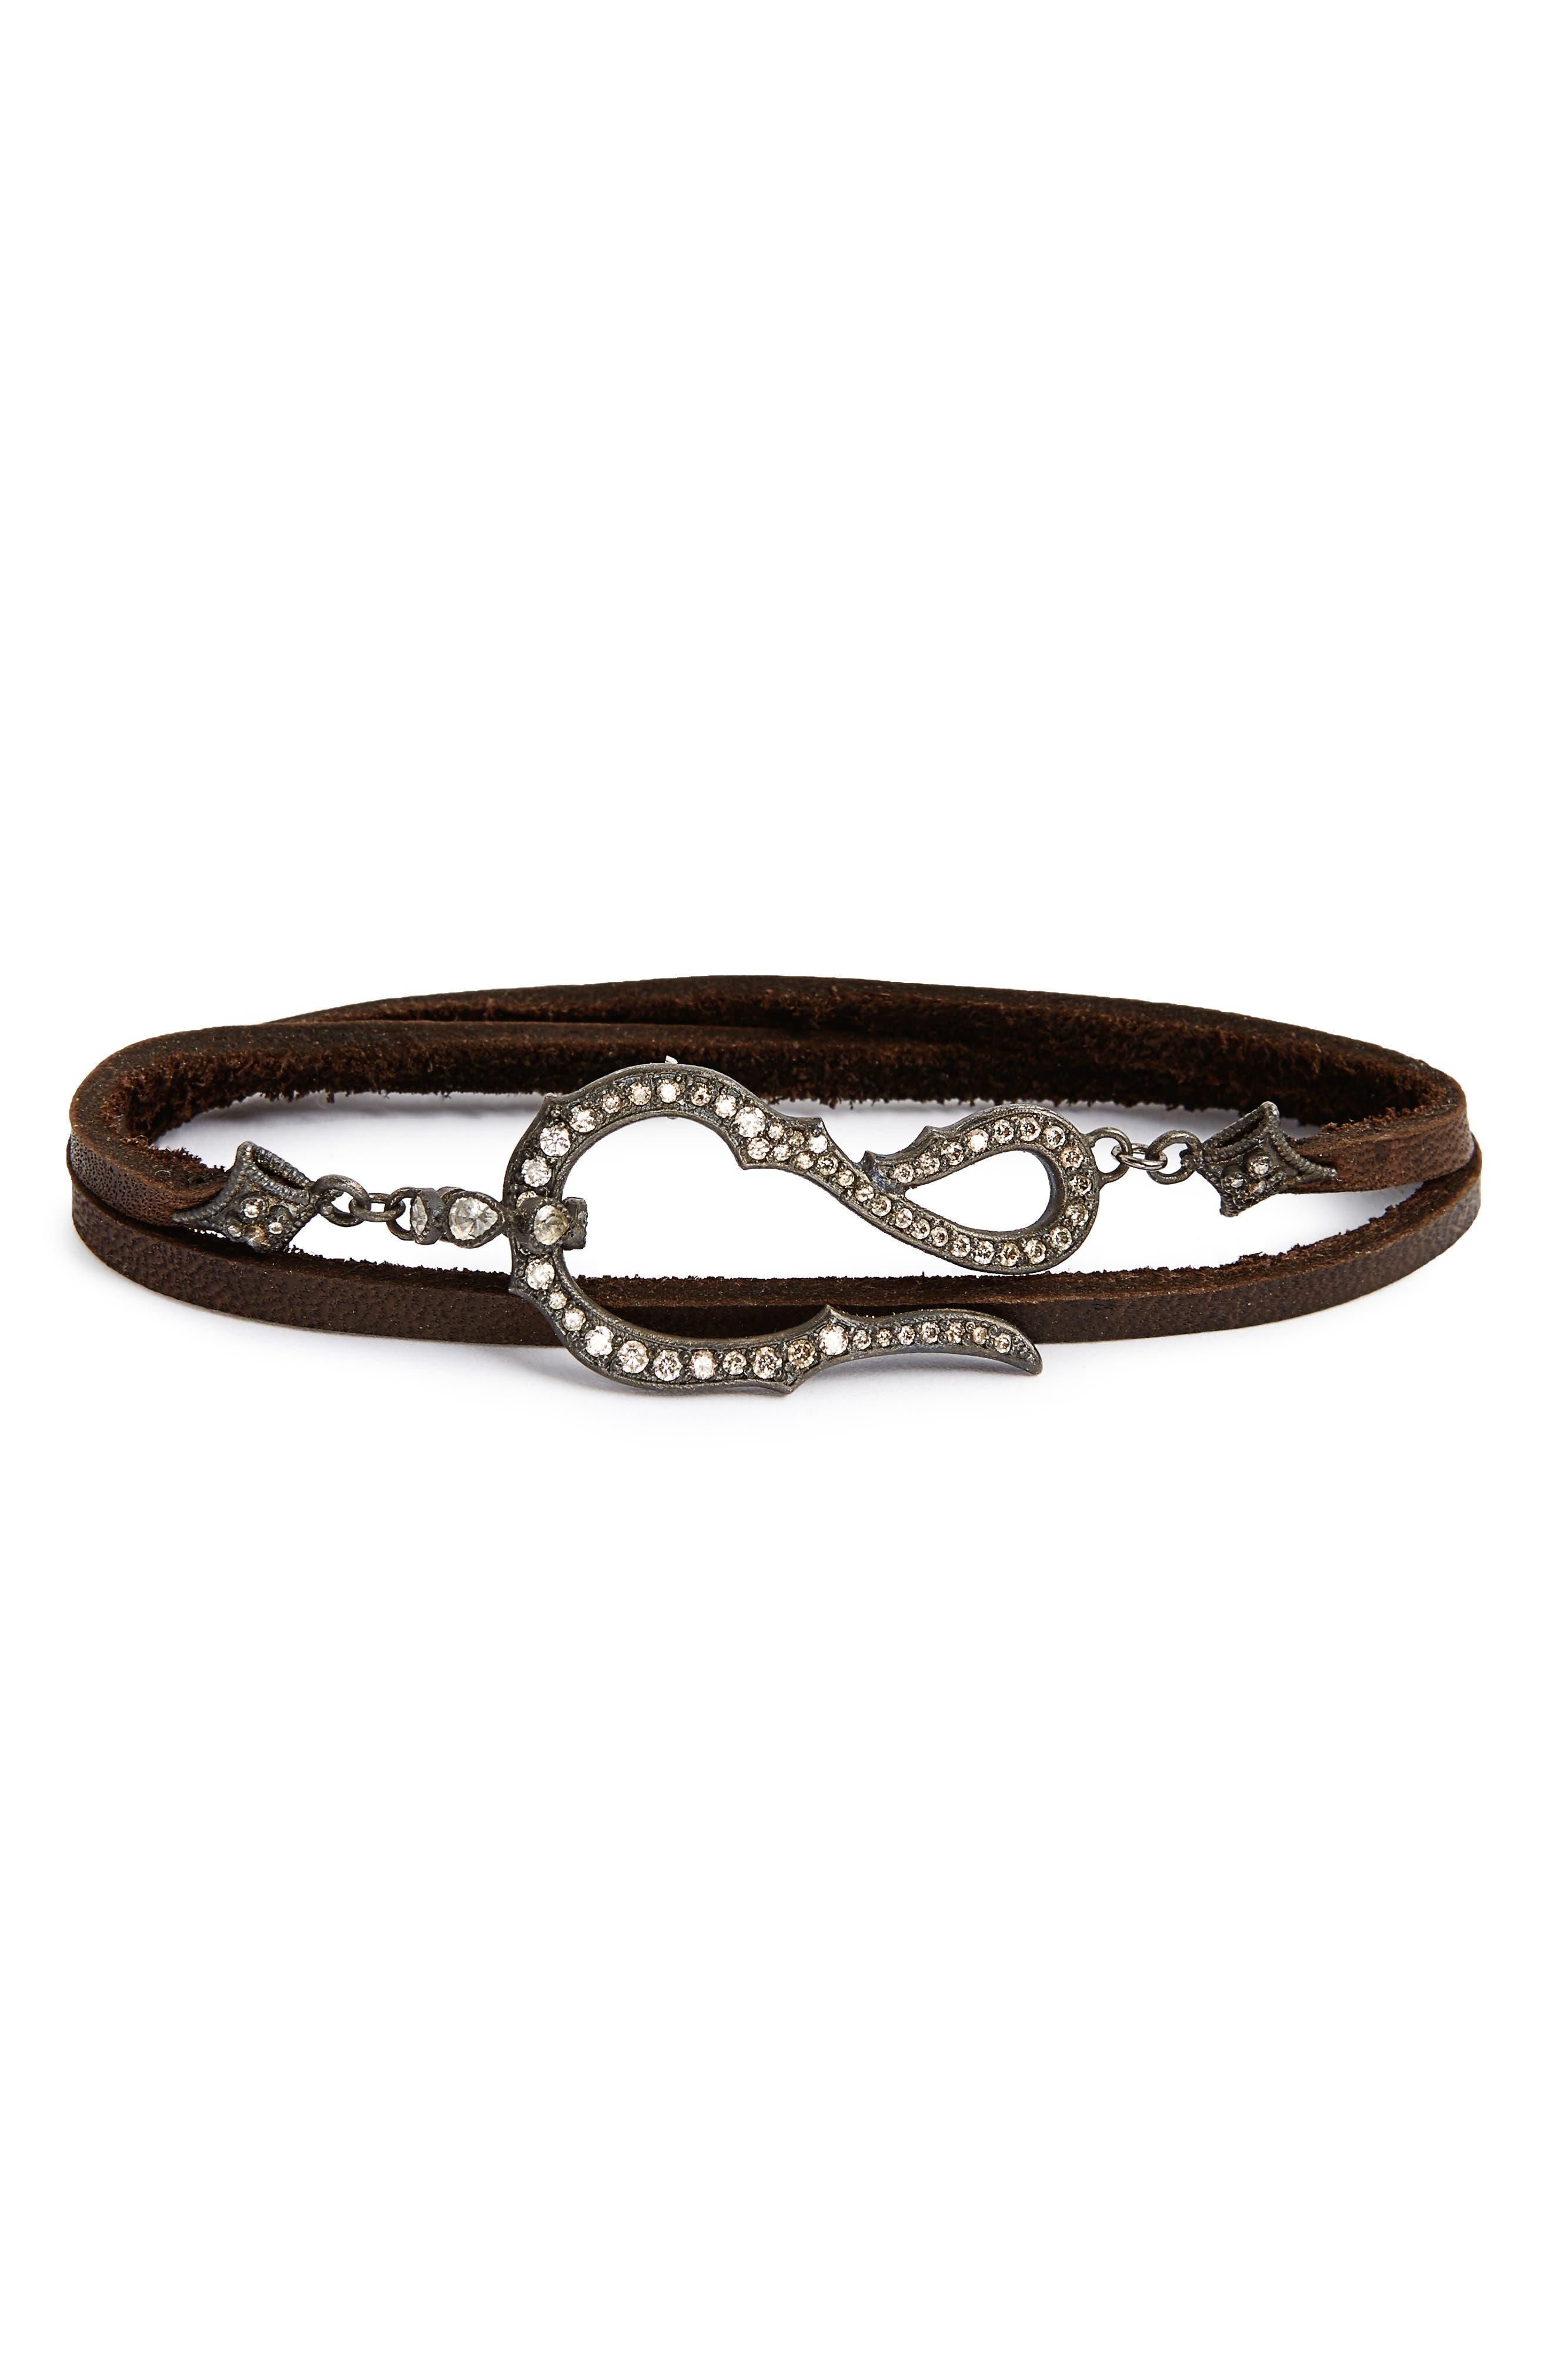 Old World Midnight Leather & Diamond Wrap Bracelet,                             Main thumbnail 1, color,                             Black